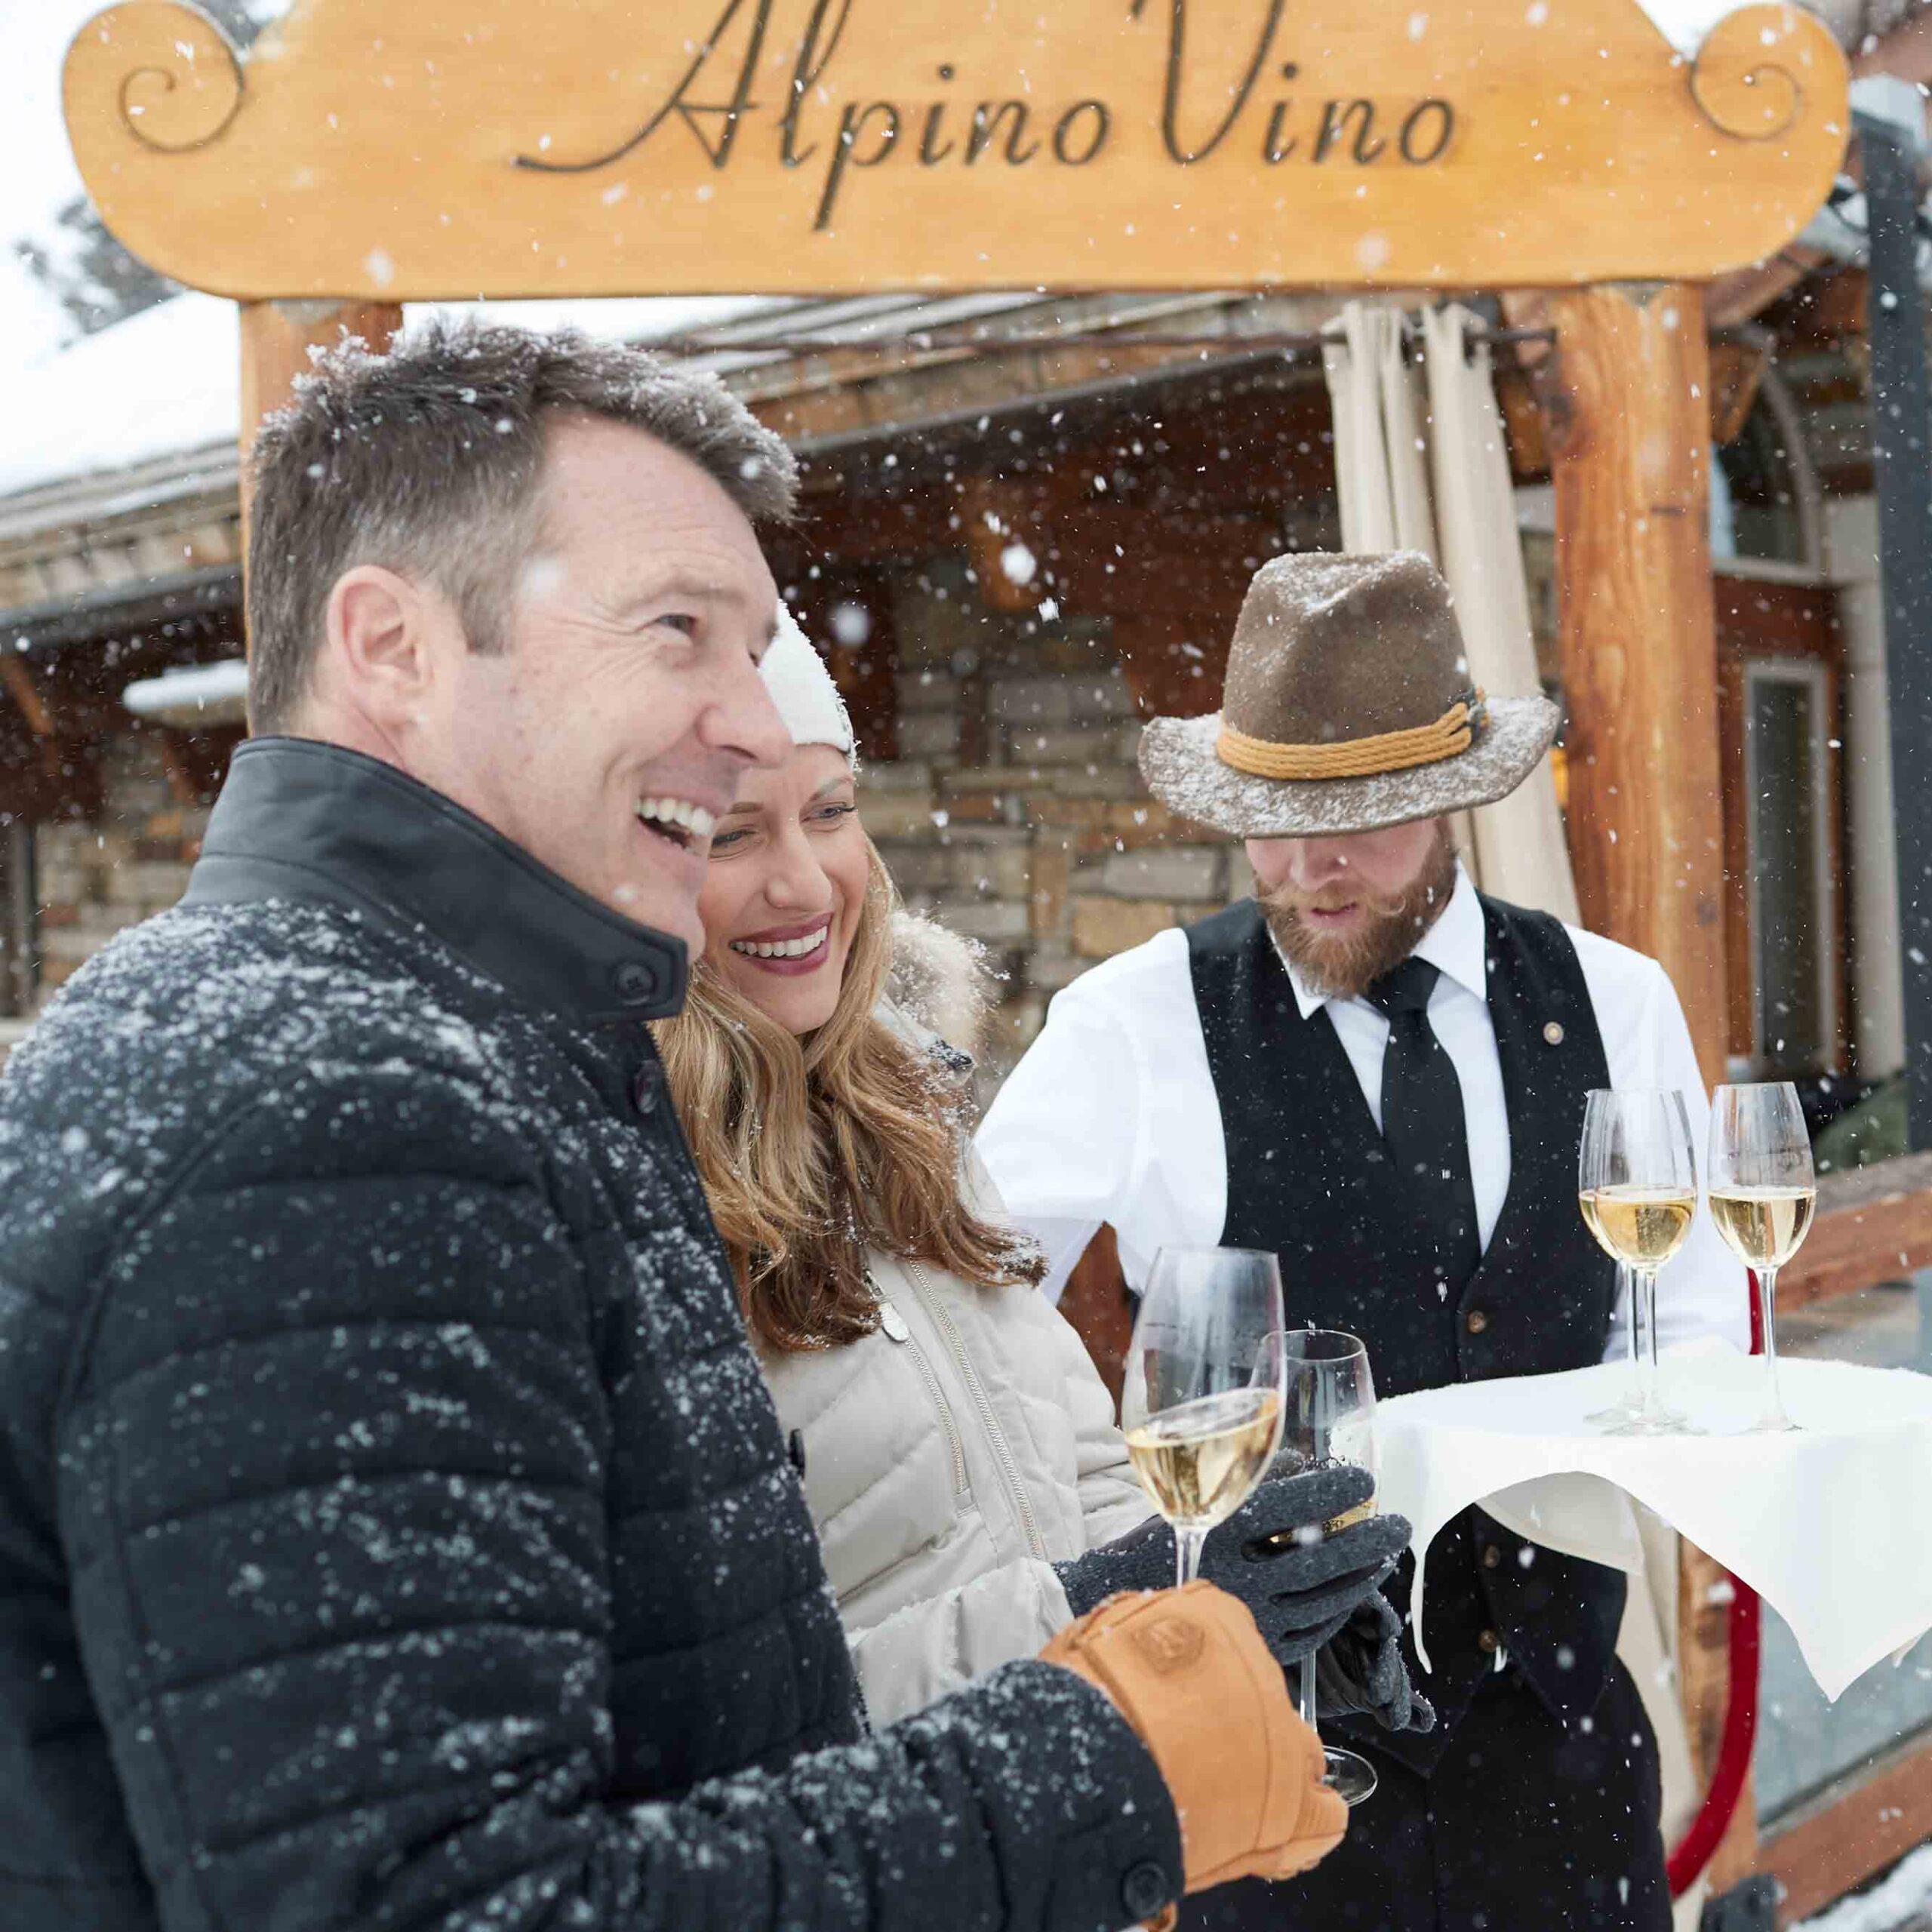 Couple with Wine at Alpino Vino